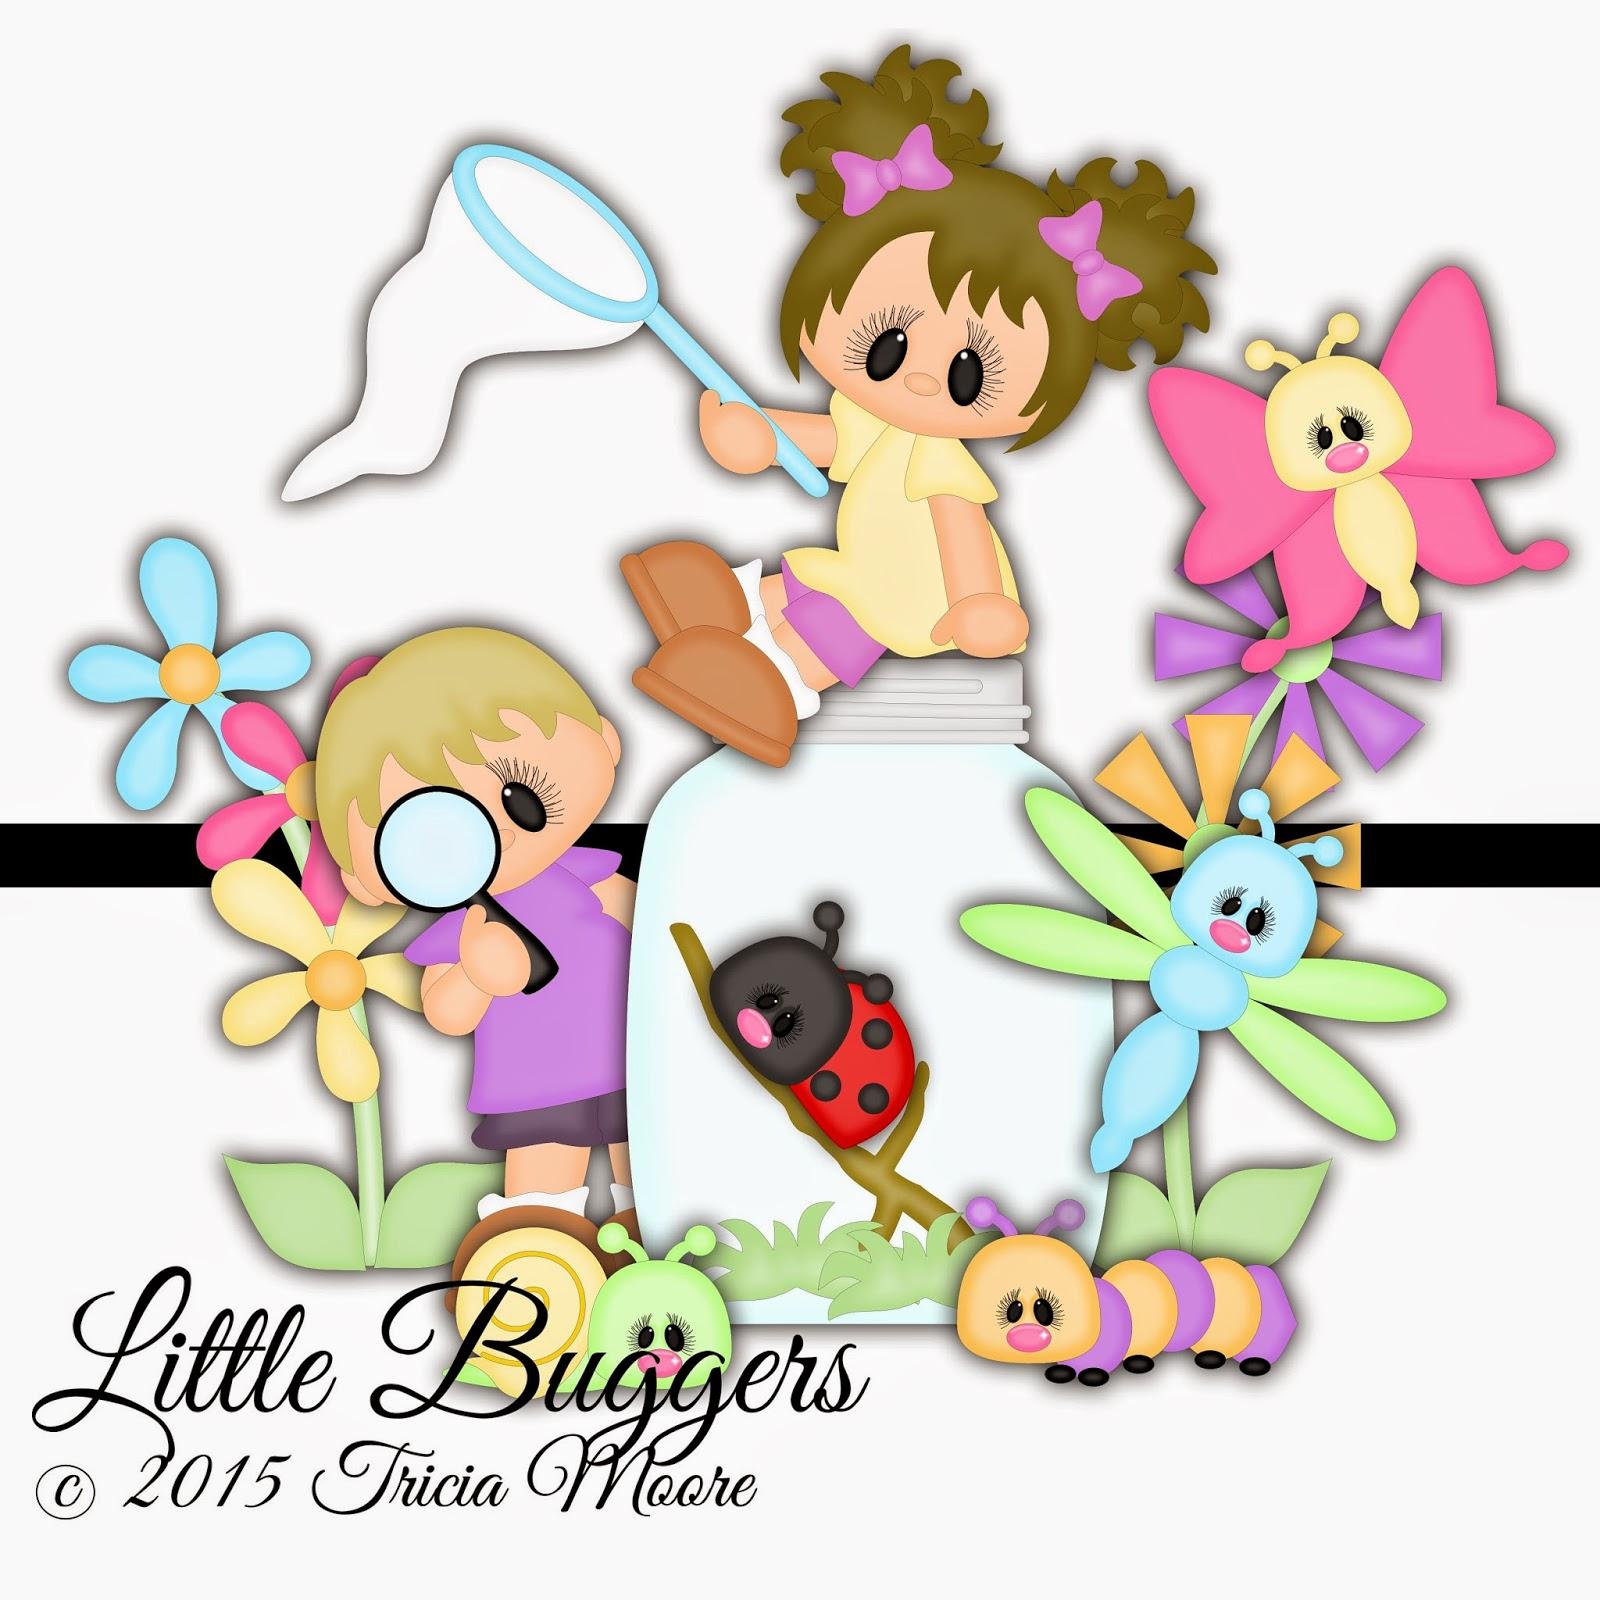 http://www.littlescrapsofheavendesigns.com/item_1305/Little-Buggers.htm